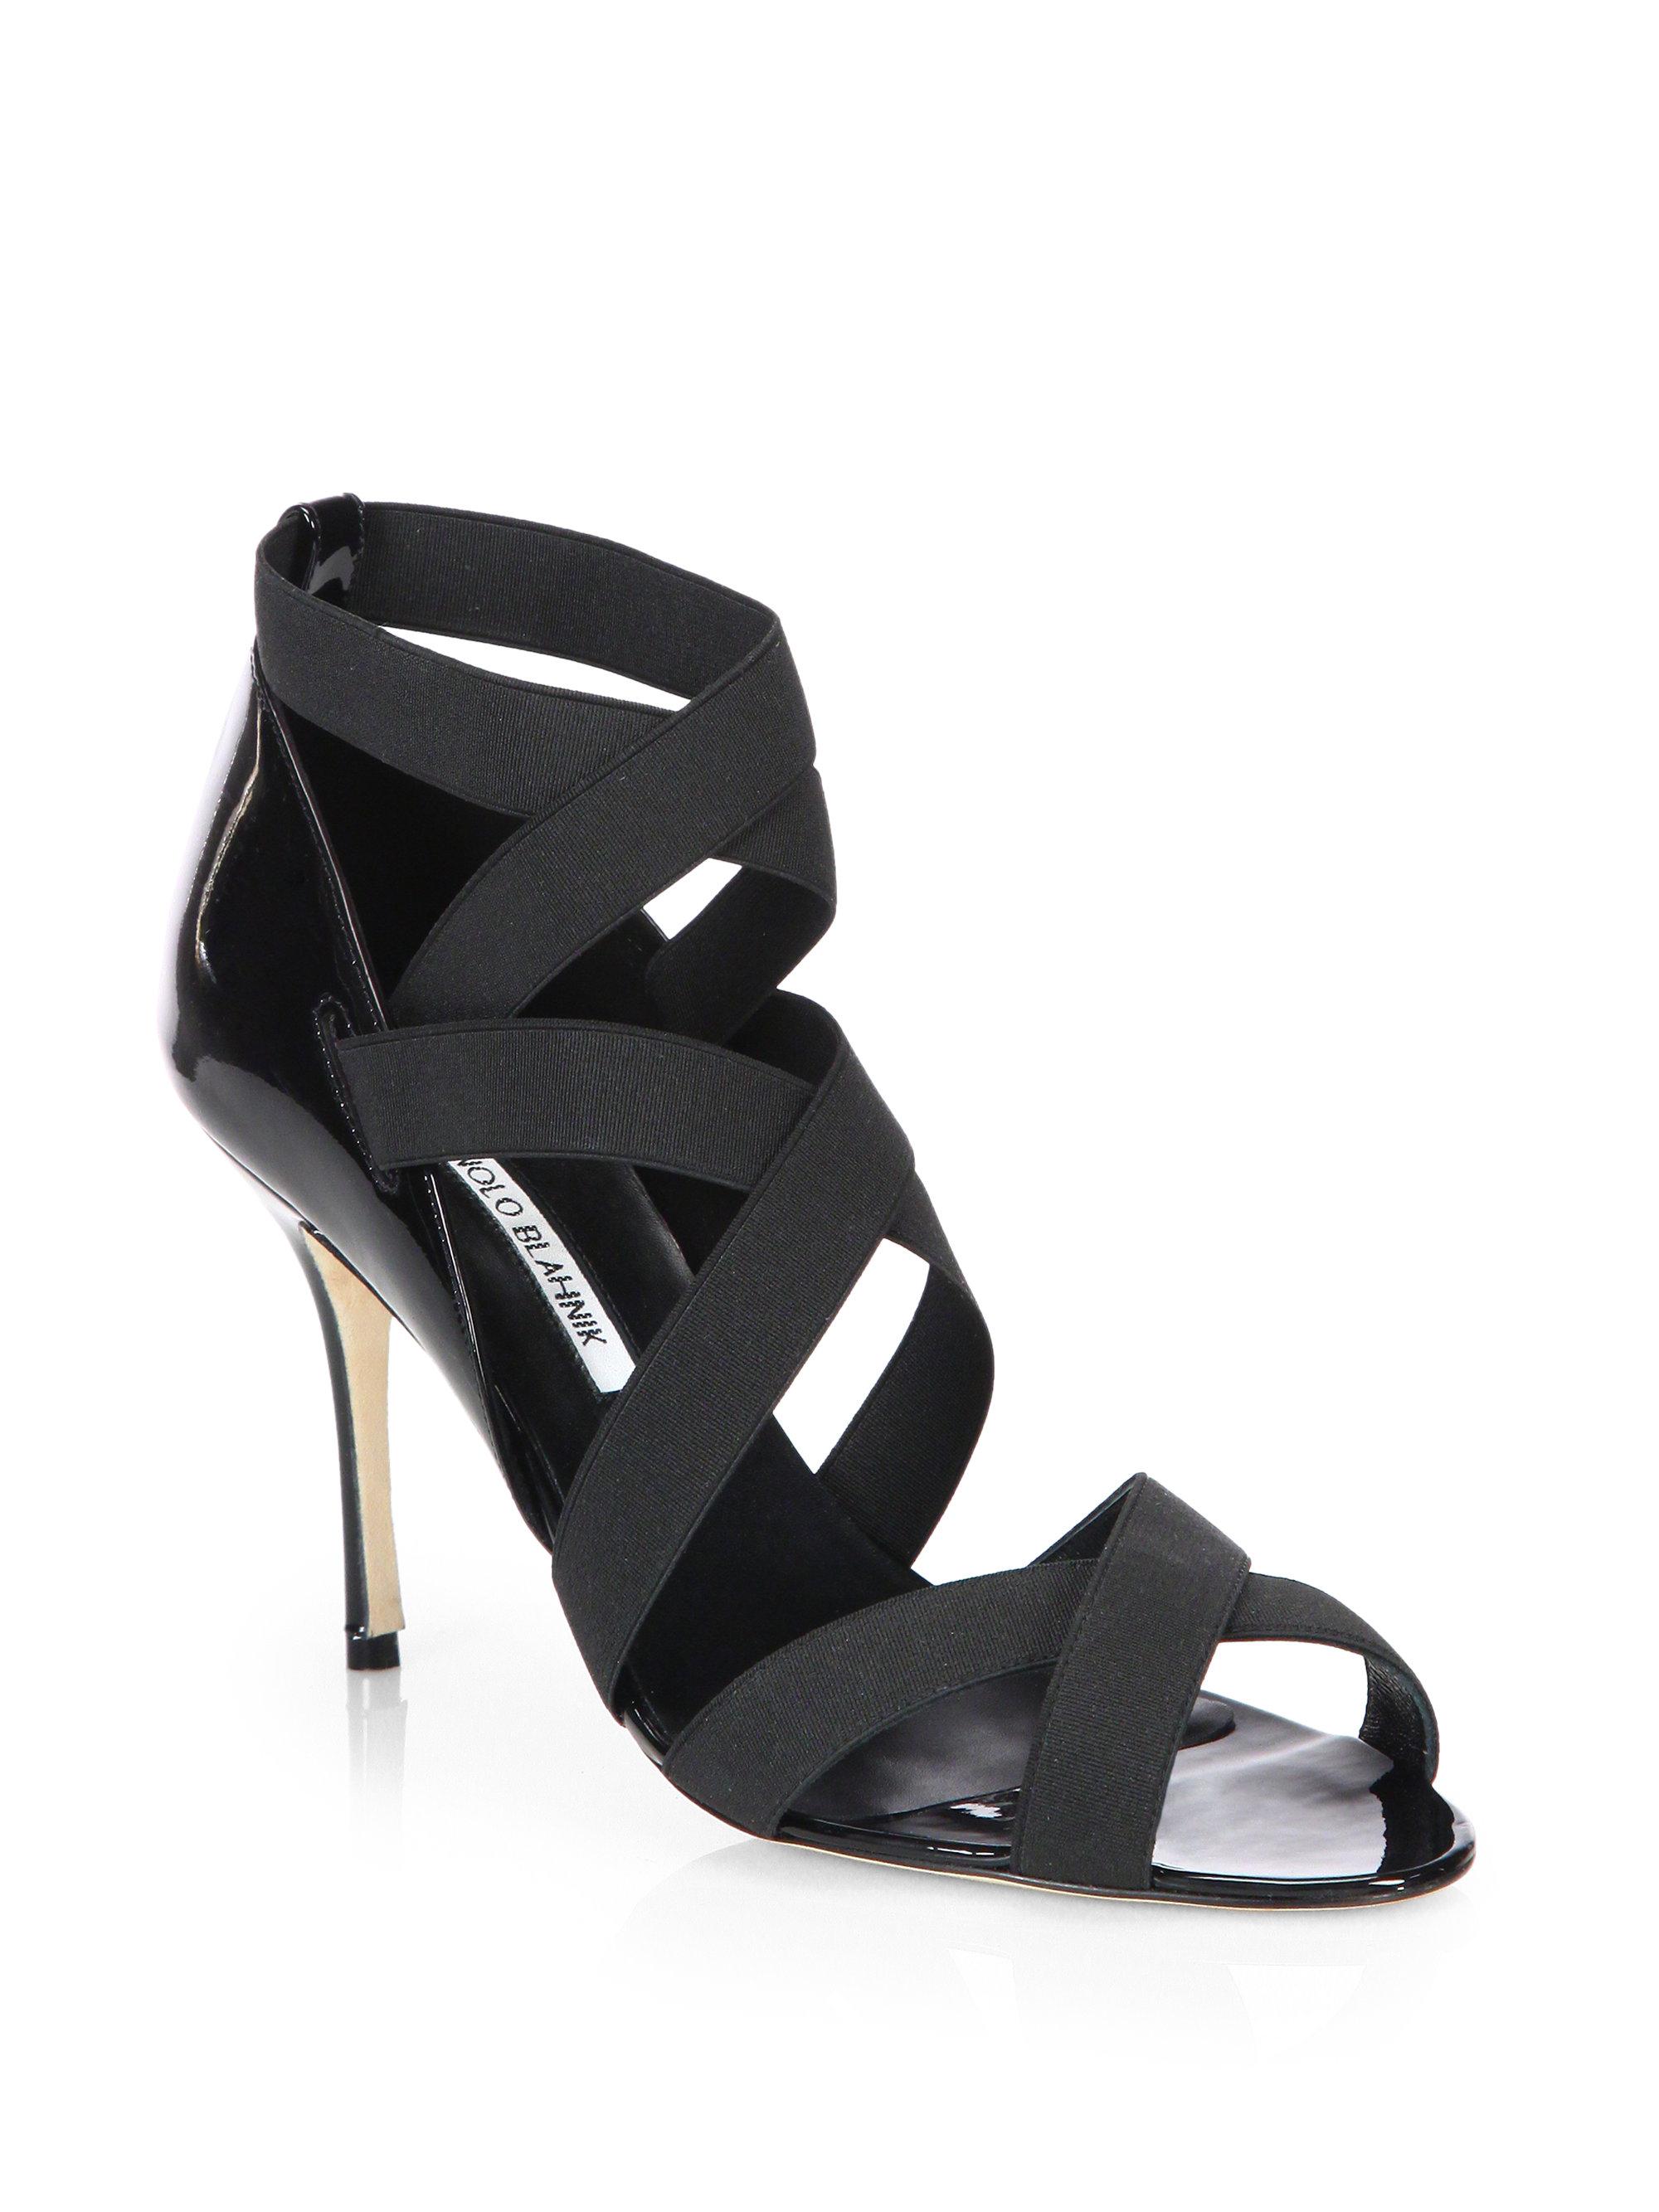 Manolo blahnik Platee Elastic Strappy Sandals in Black